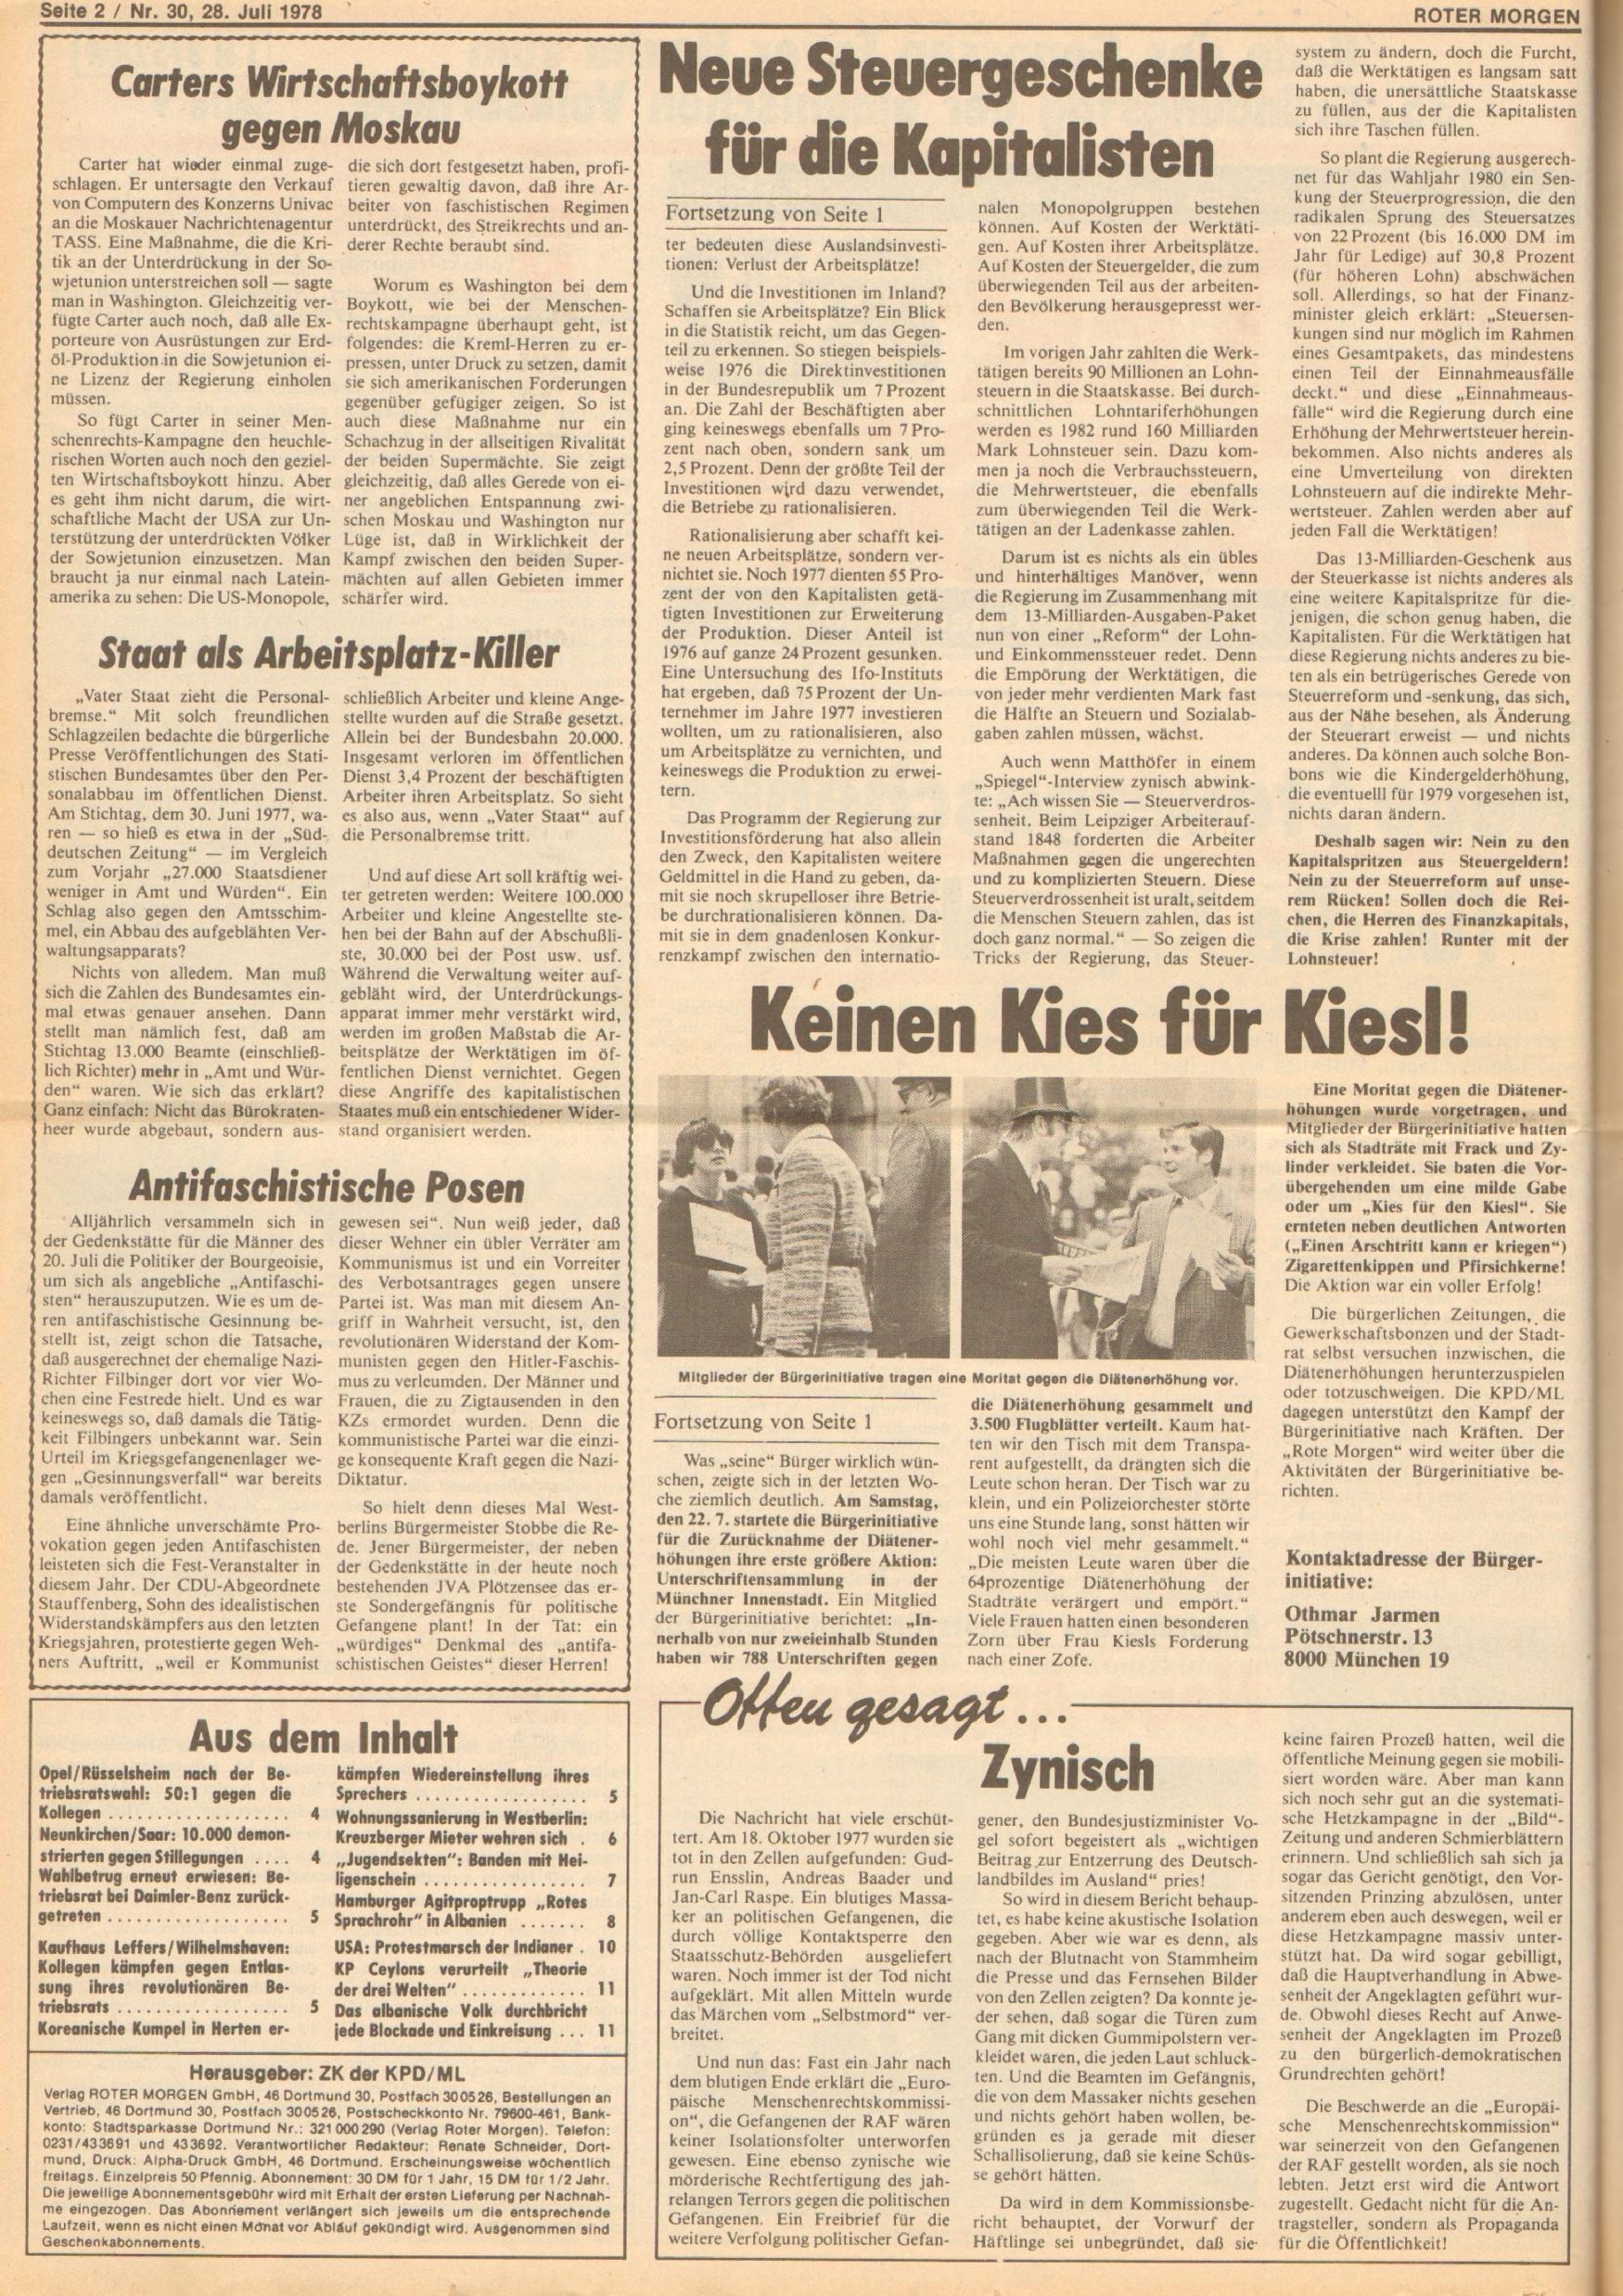 Roter Morgen, 12. Jg., 28. Juli 1978, Nr. 30, Seite 2